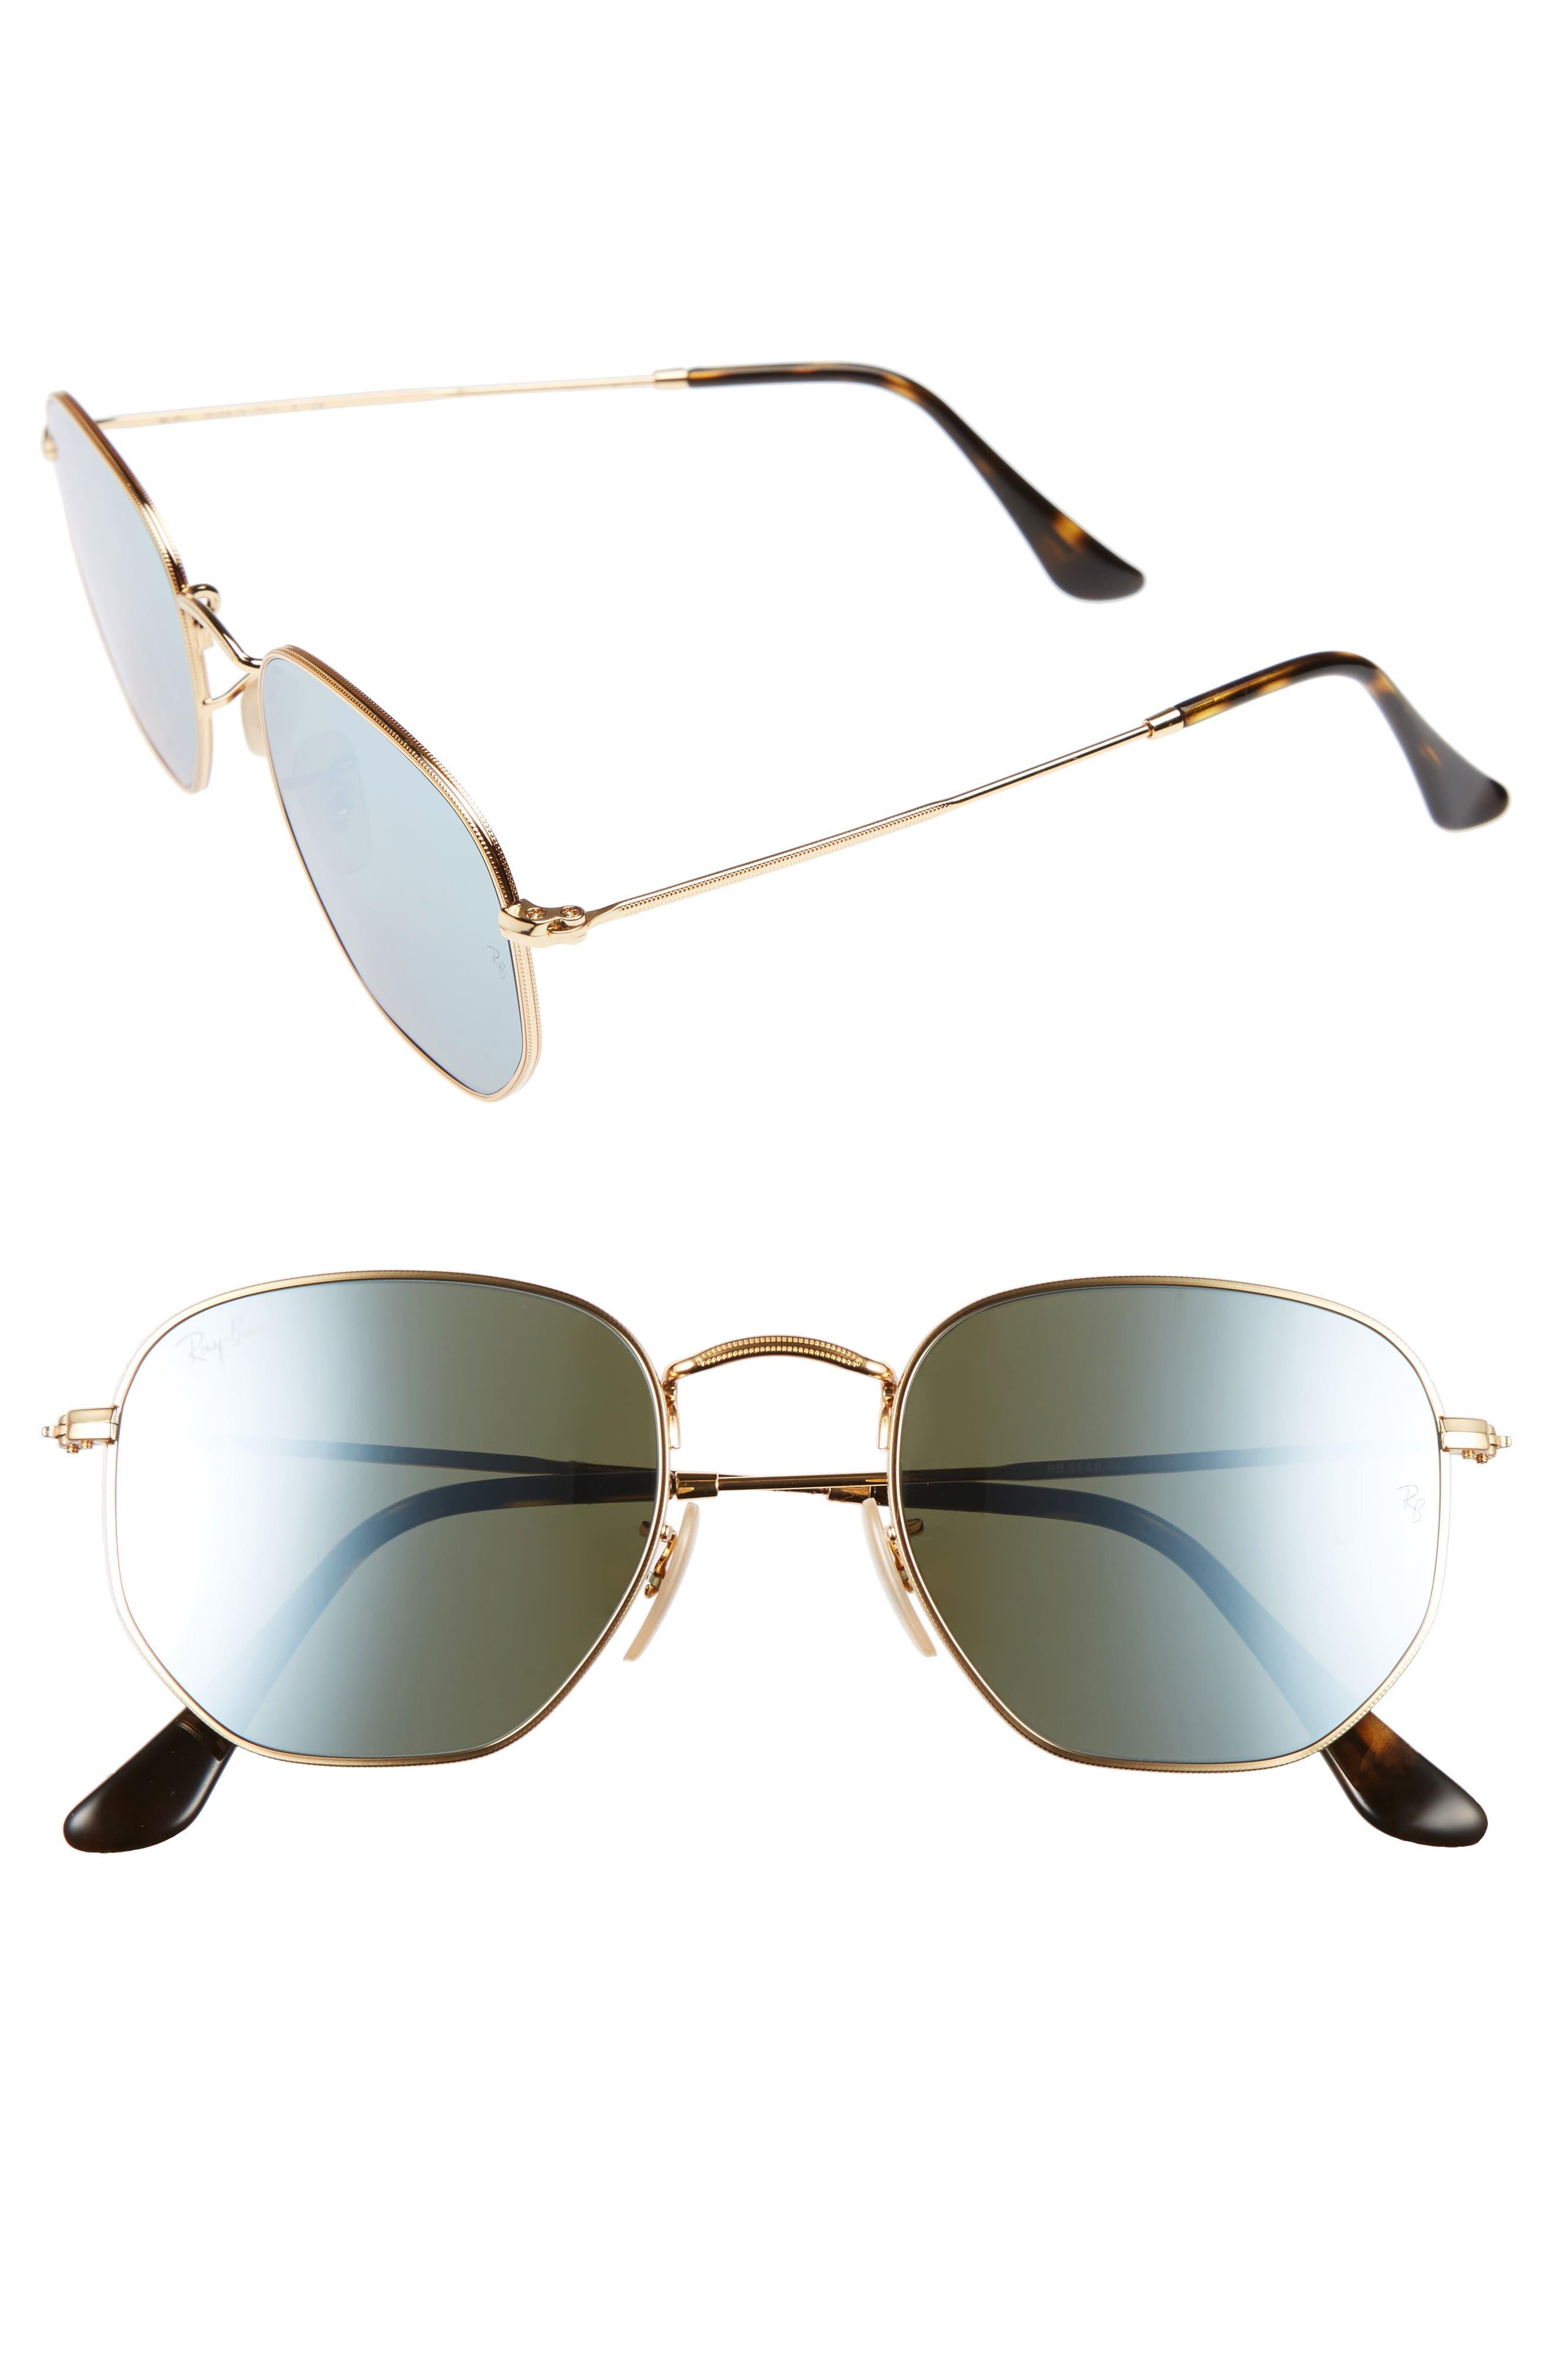 51mm Sunglasses,                             Main thumbnail 1, color,                             710